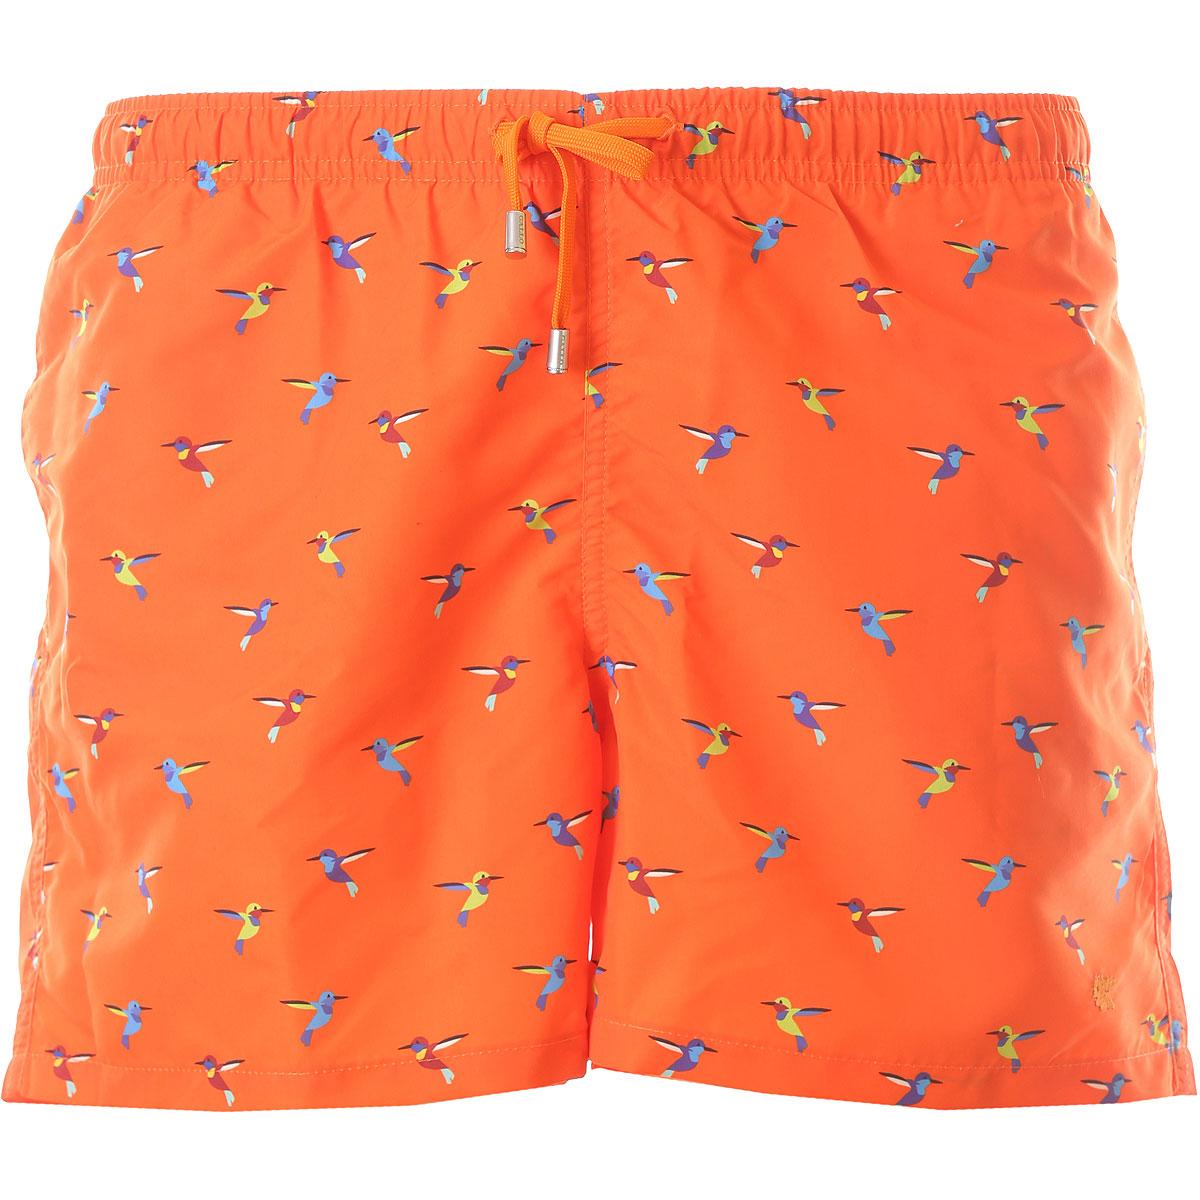 Gallo Mens Swimwear On Sale, Orange, polyester, 2019, S M L XL